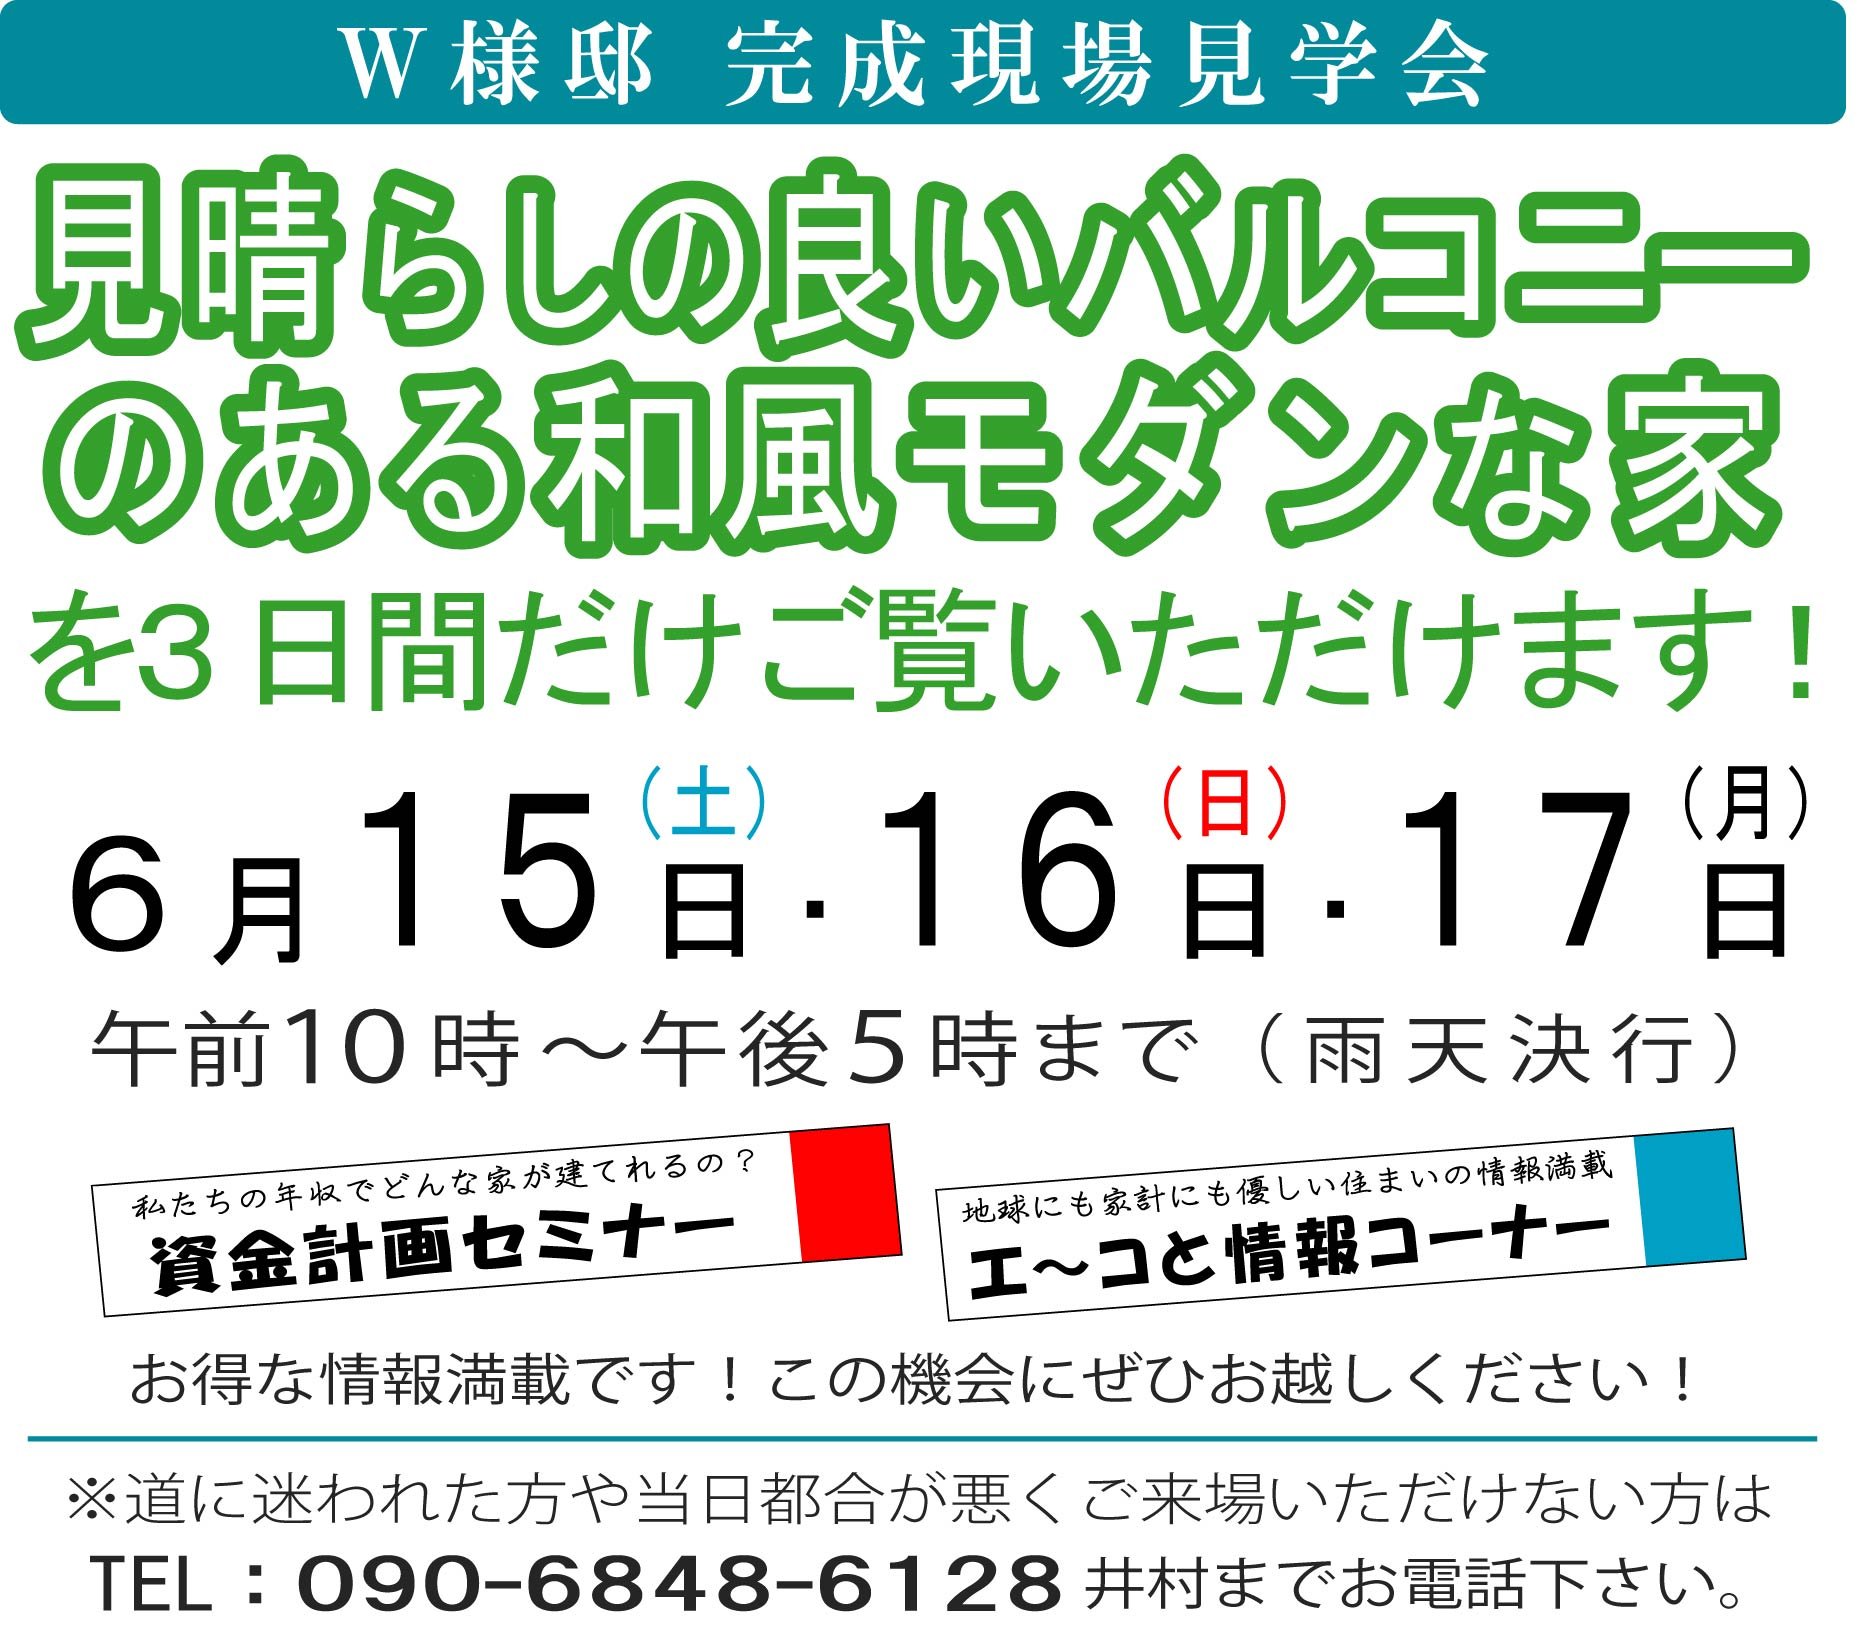 KuraSi-natu-sin72-04.jpg